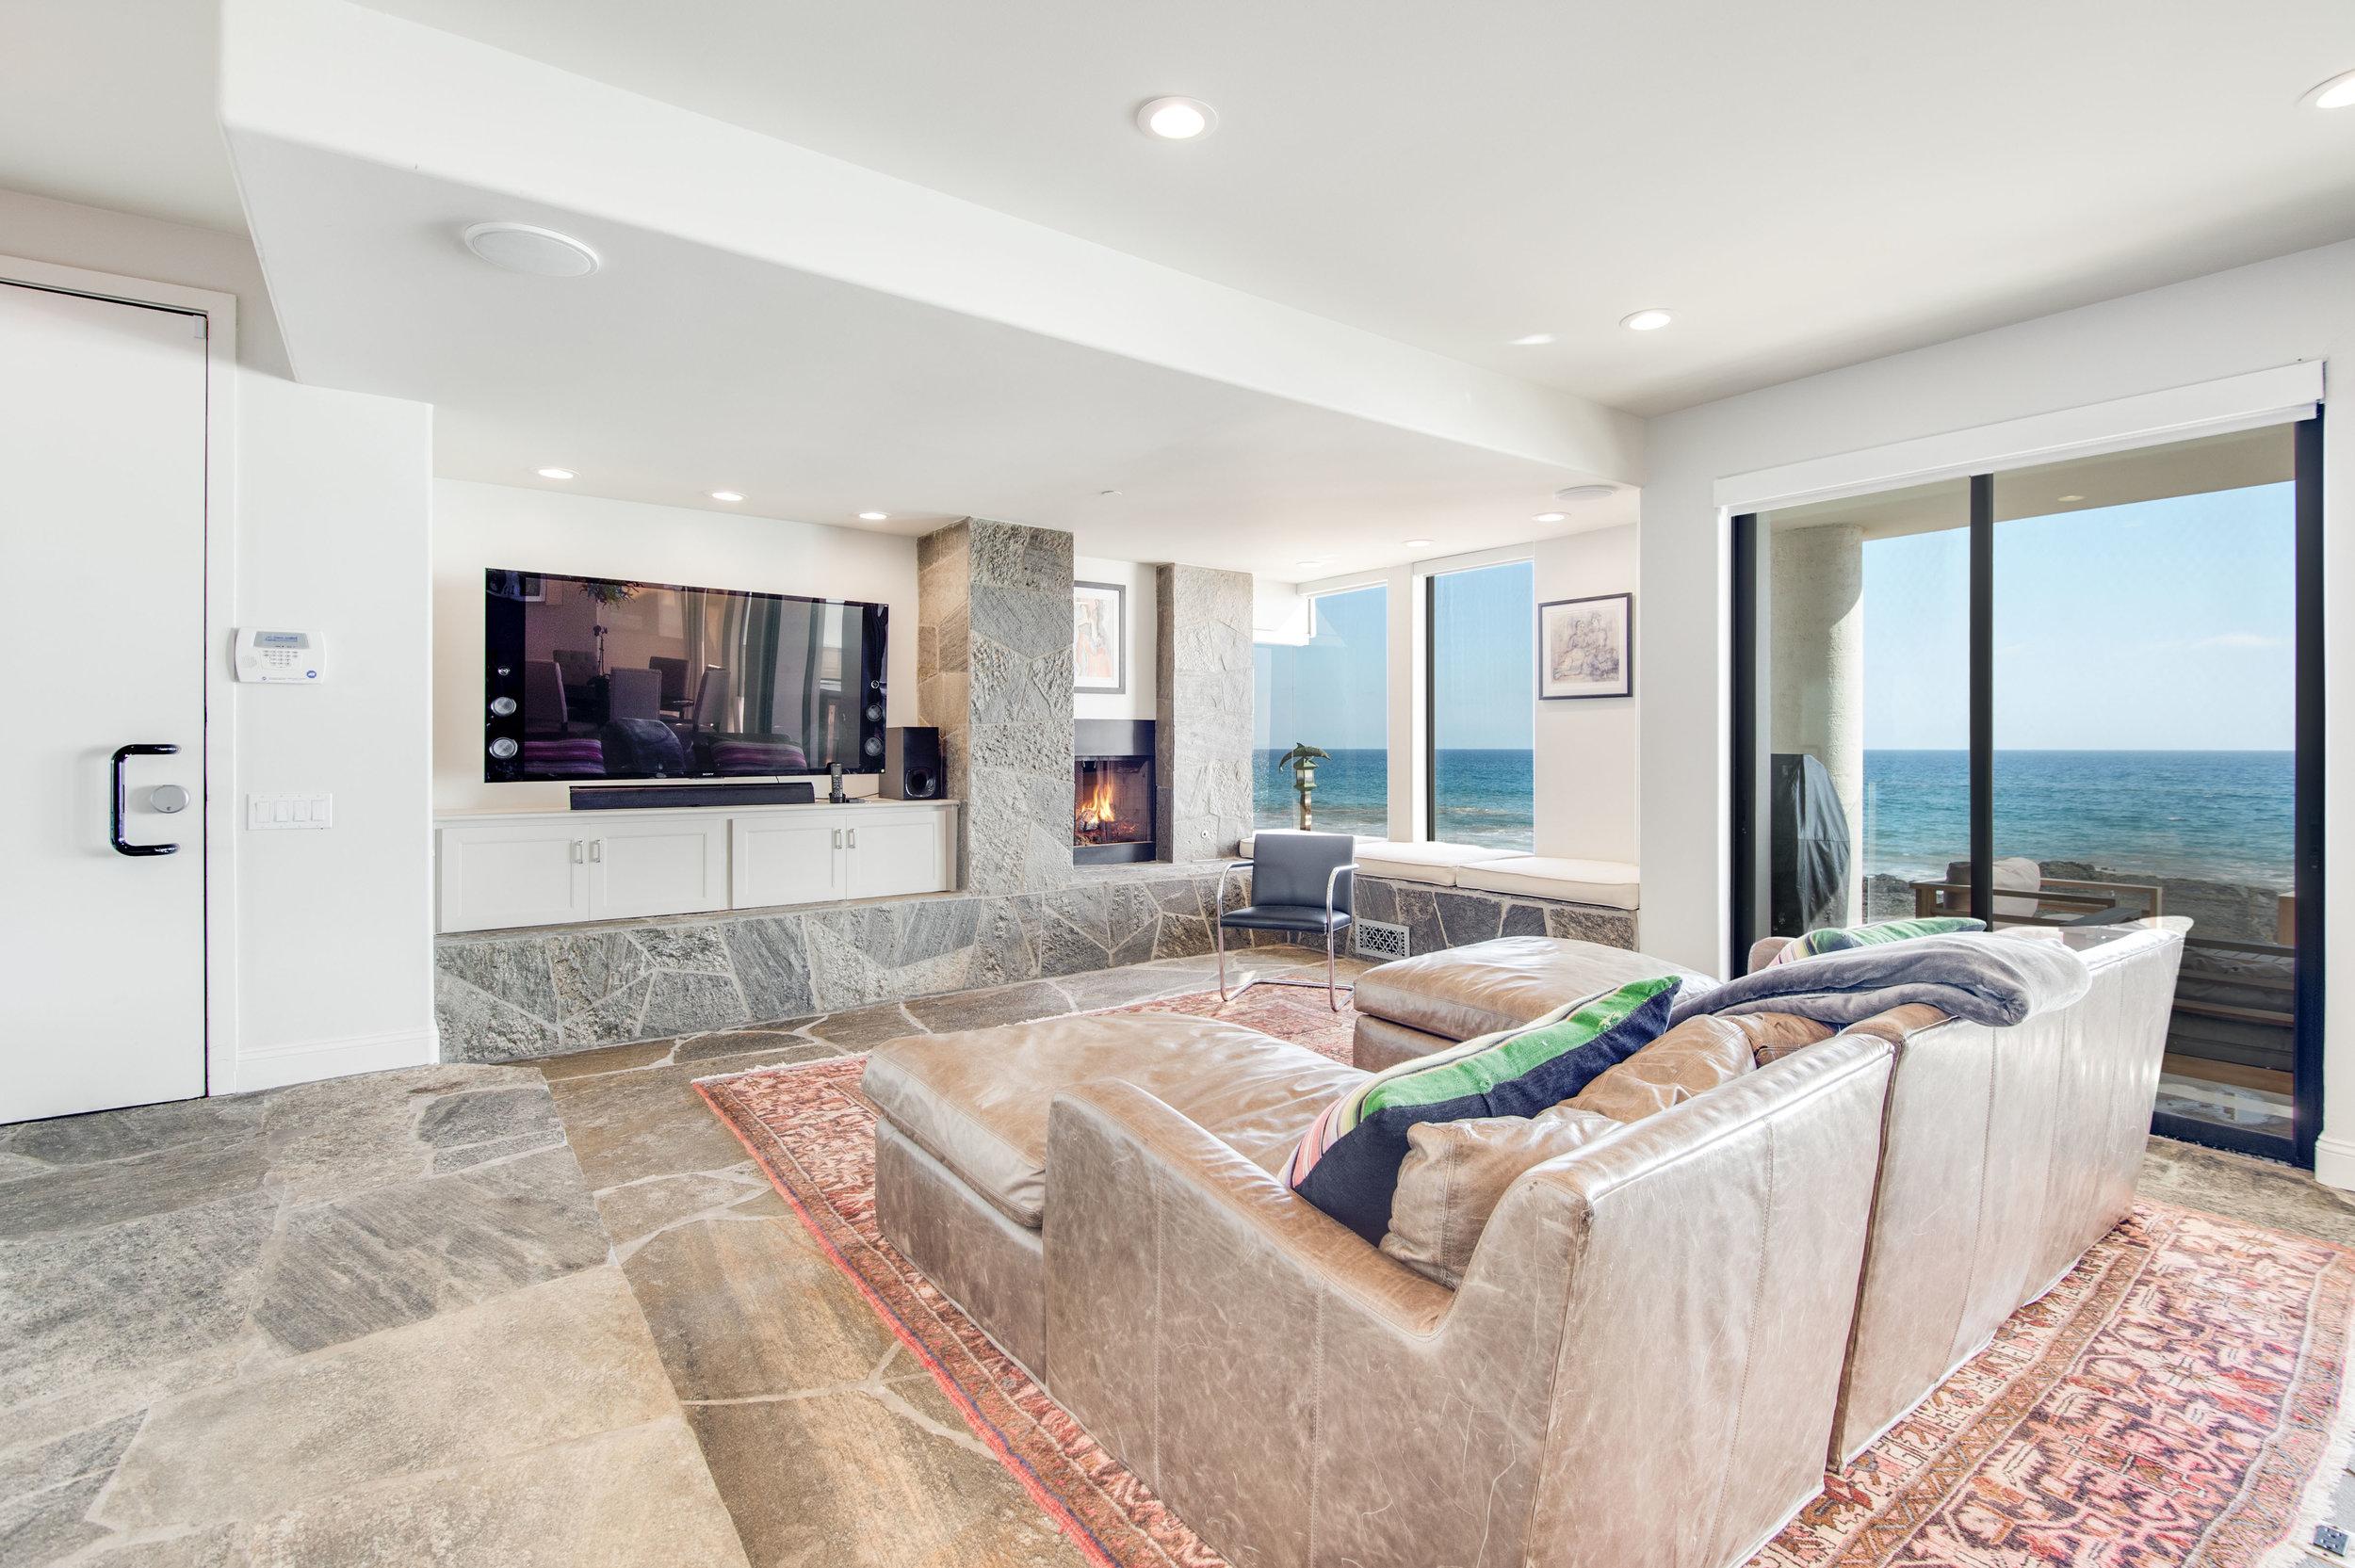 024 Living Room 25252 Malibu Road For Sale Lease The Malibu Life Team Luxury Real Estate.jpg